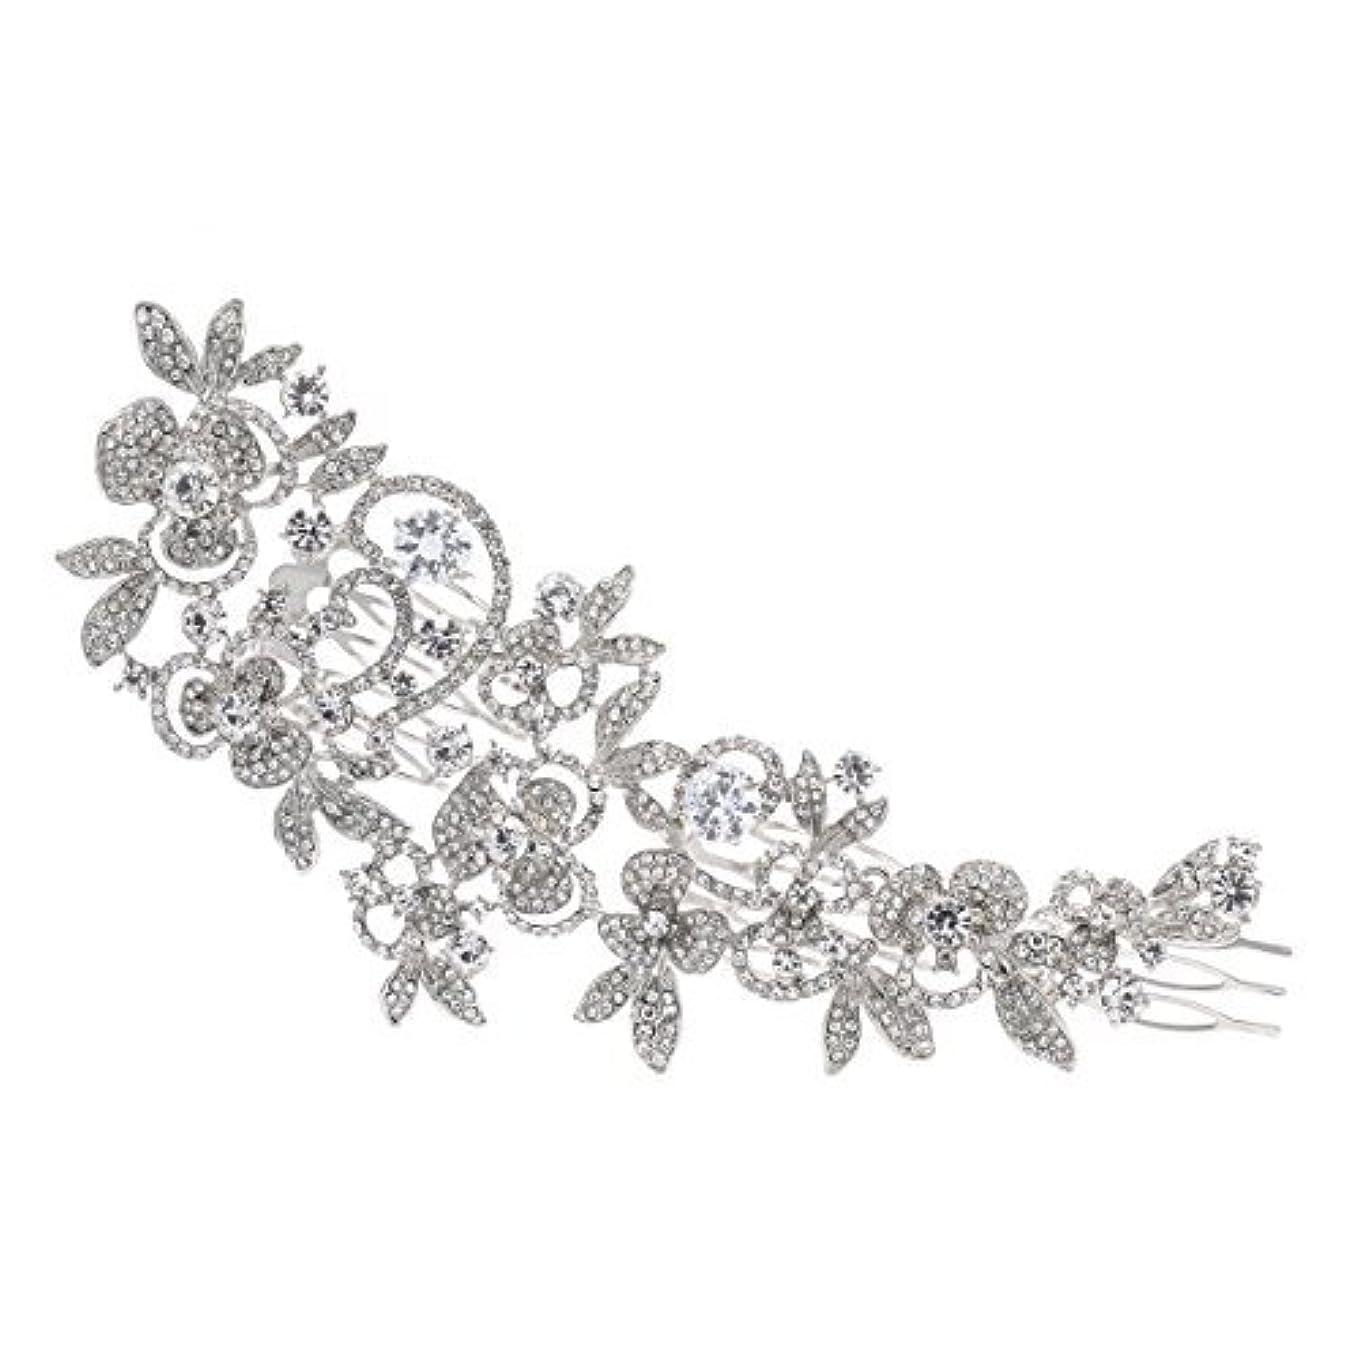 Sparkly Long Flower Hair Comb Rhinestone Hairpins Bridal Wedding Hair Accessories Jewelry Austrian Crystals Hair...